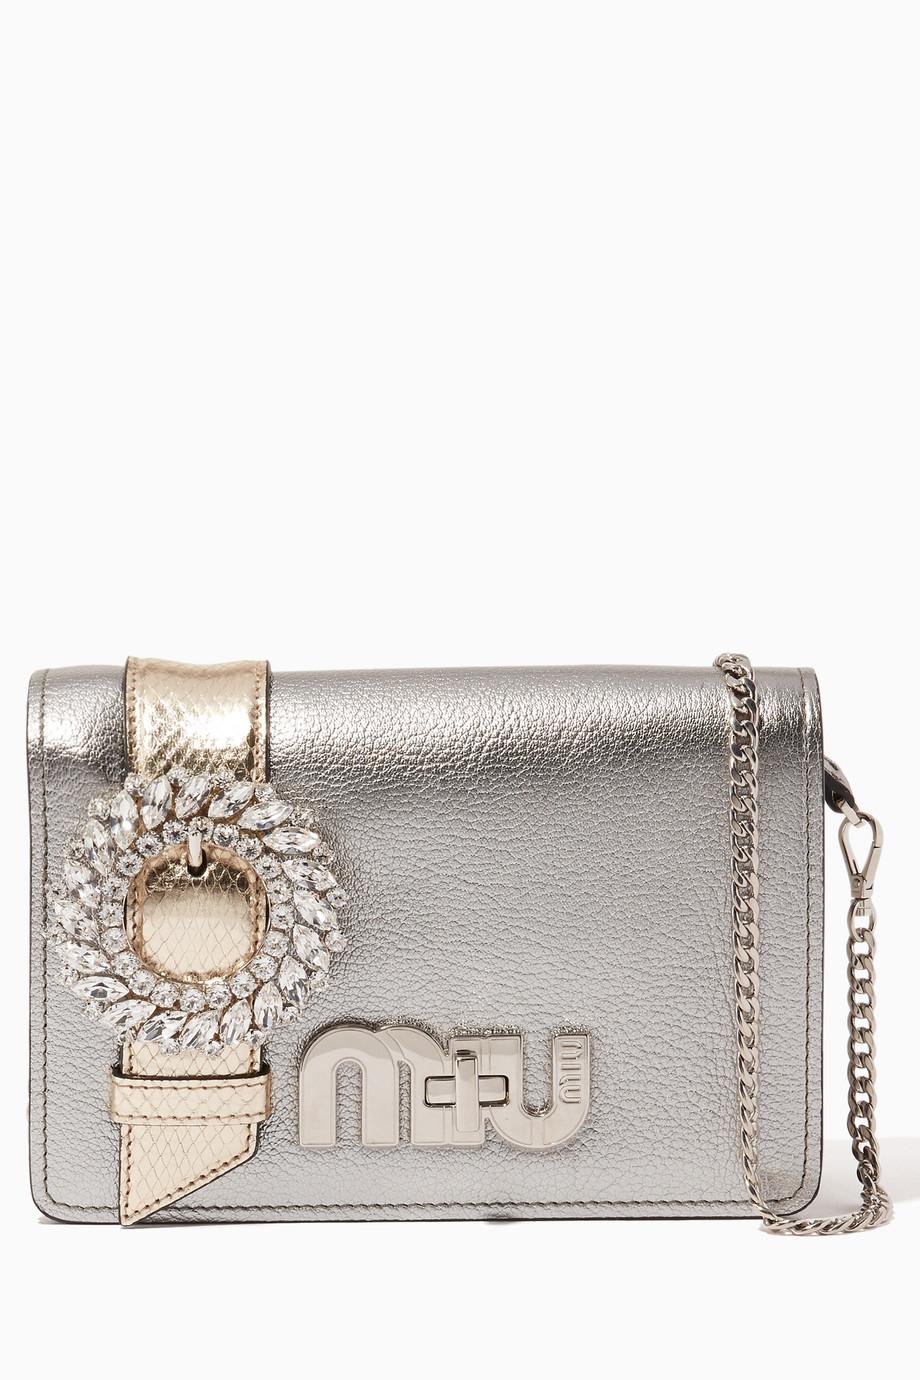 354d50df354 Shop Miu Miu Silver Silver Small My Miu Cross-Body Bag for Women ...